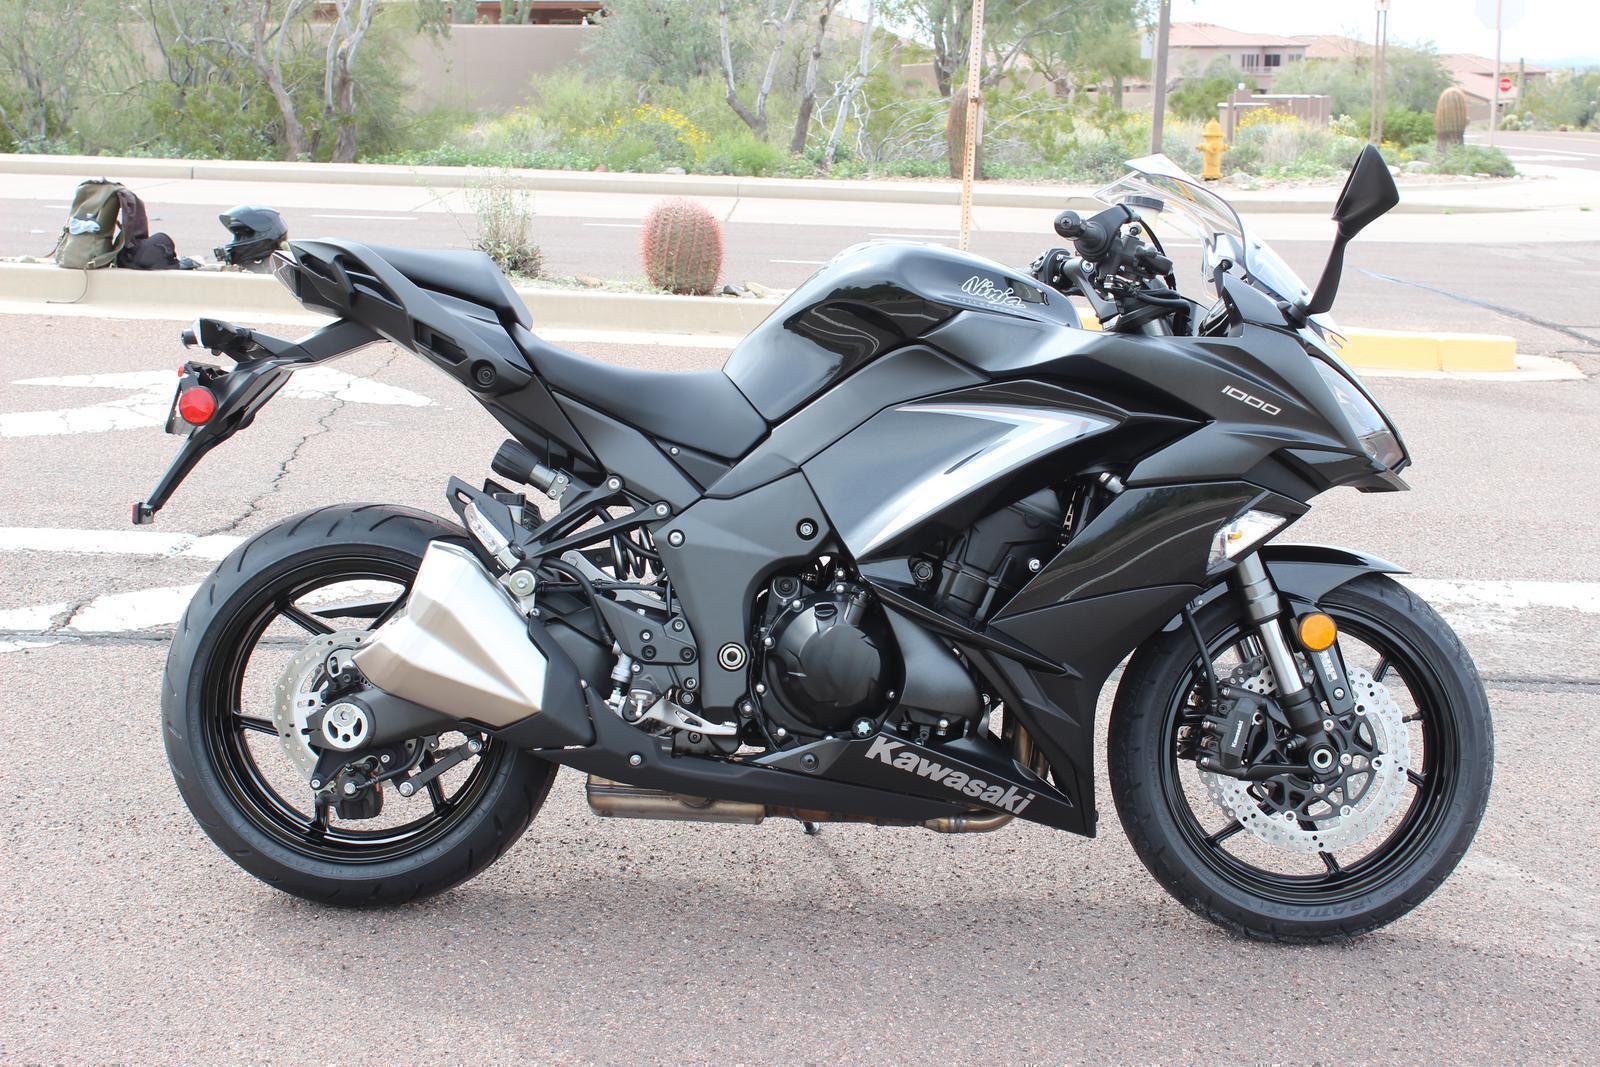 2019 Kawasaki Ninja 1000 Abs For Sale In Scottsdale Az Go Az